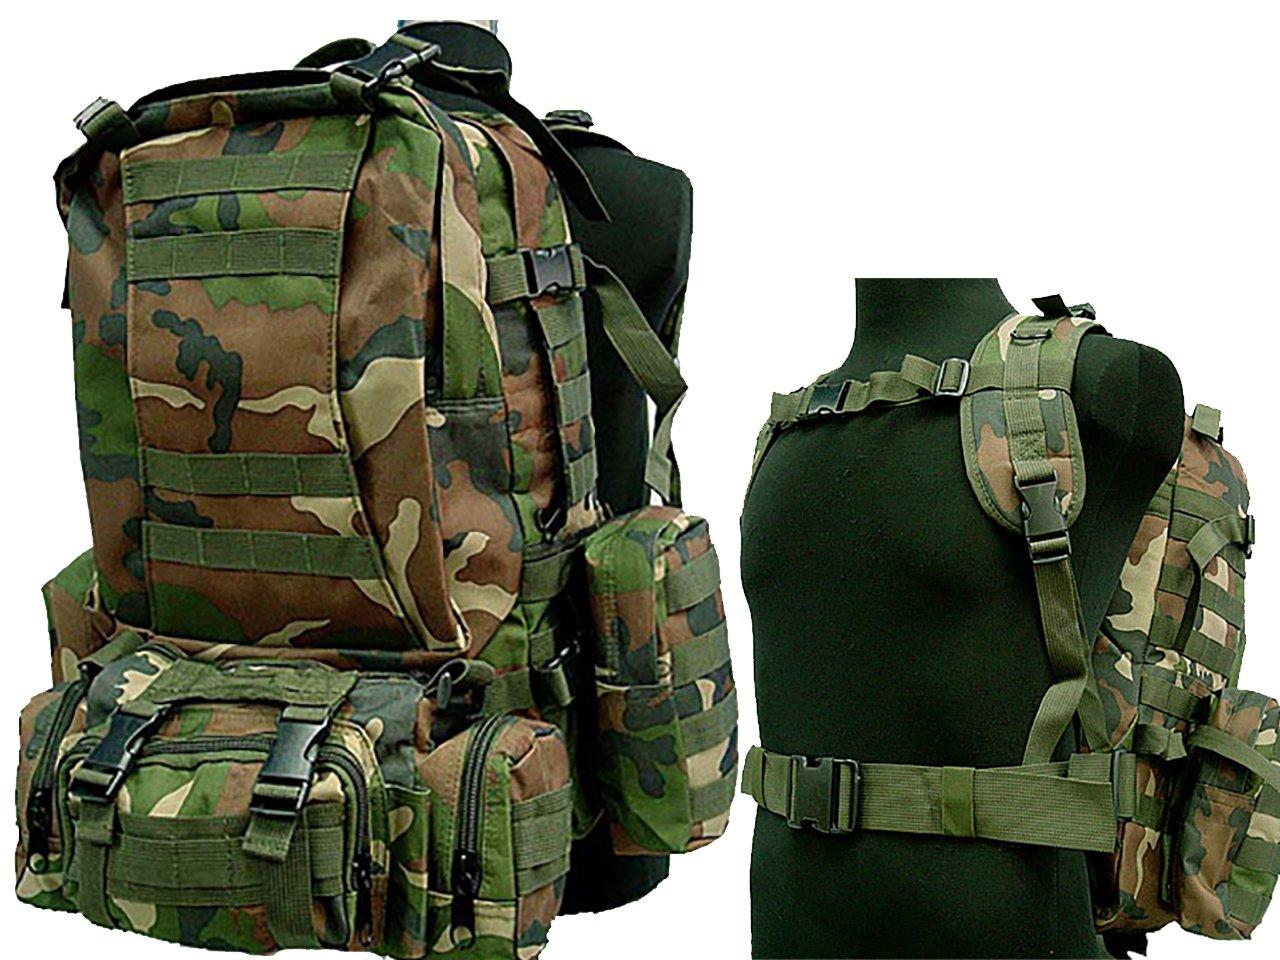 50lタクティカルMOLLE Assault Military RucksacksバックパックハイキングキャンピングバッグWC   B0797N1QFV